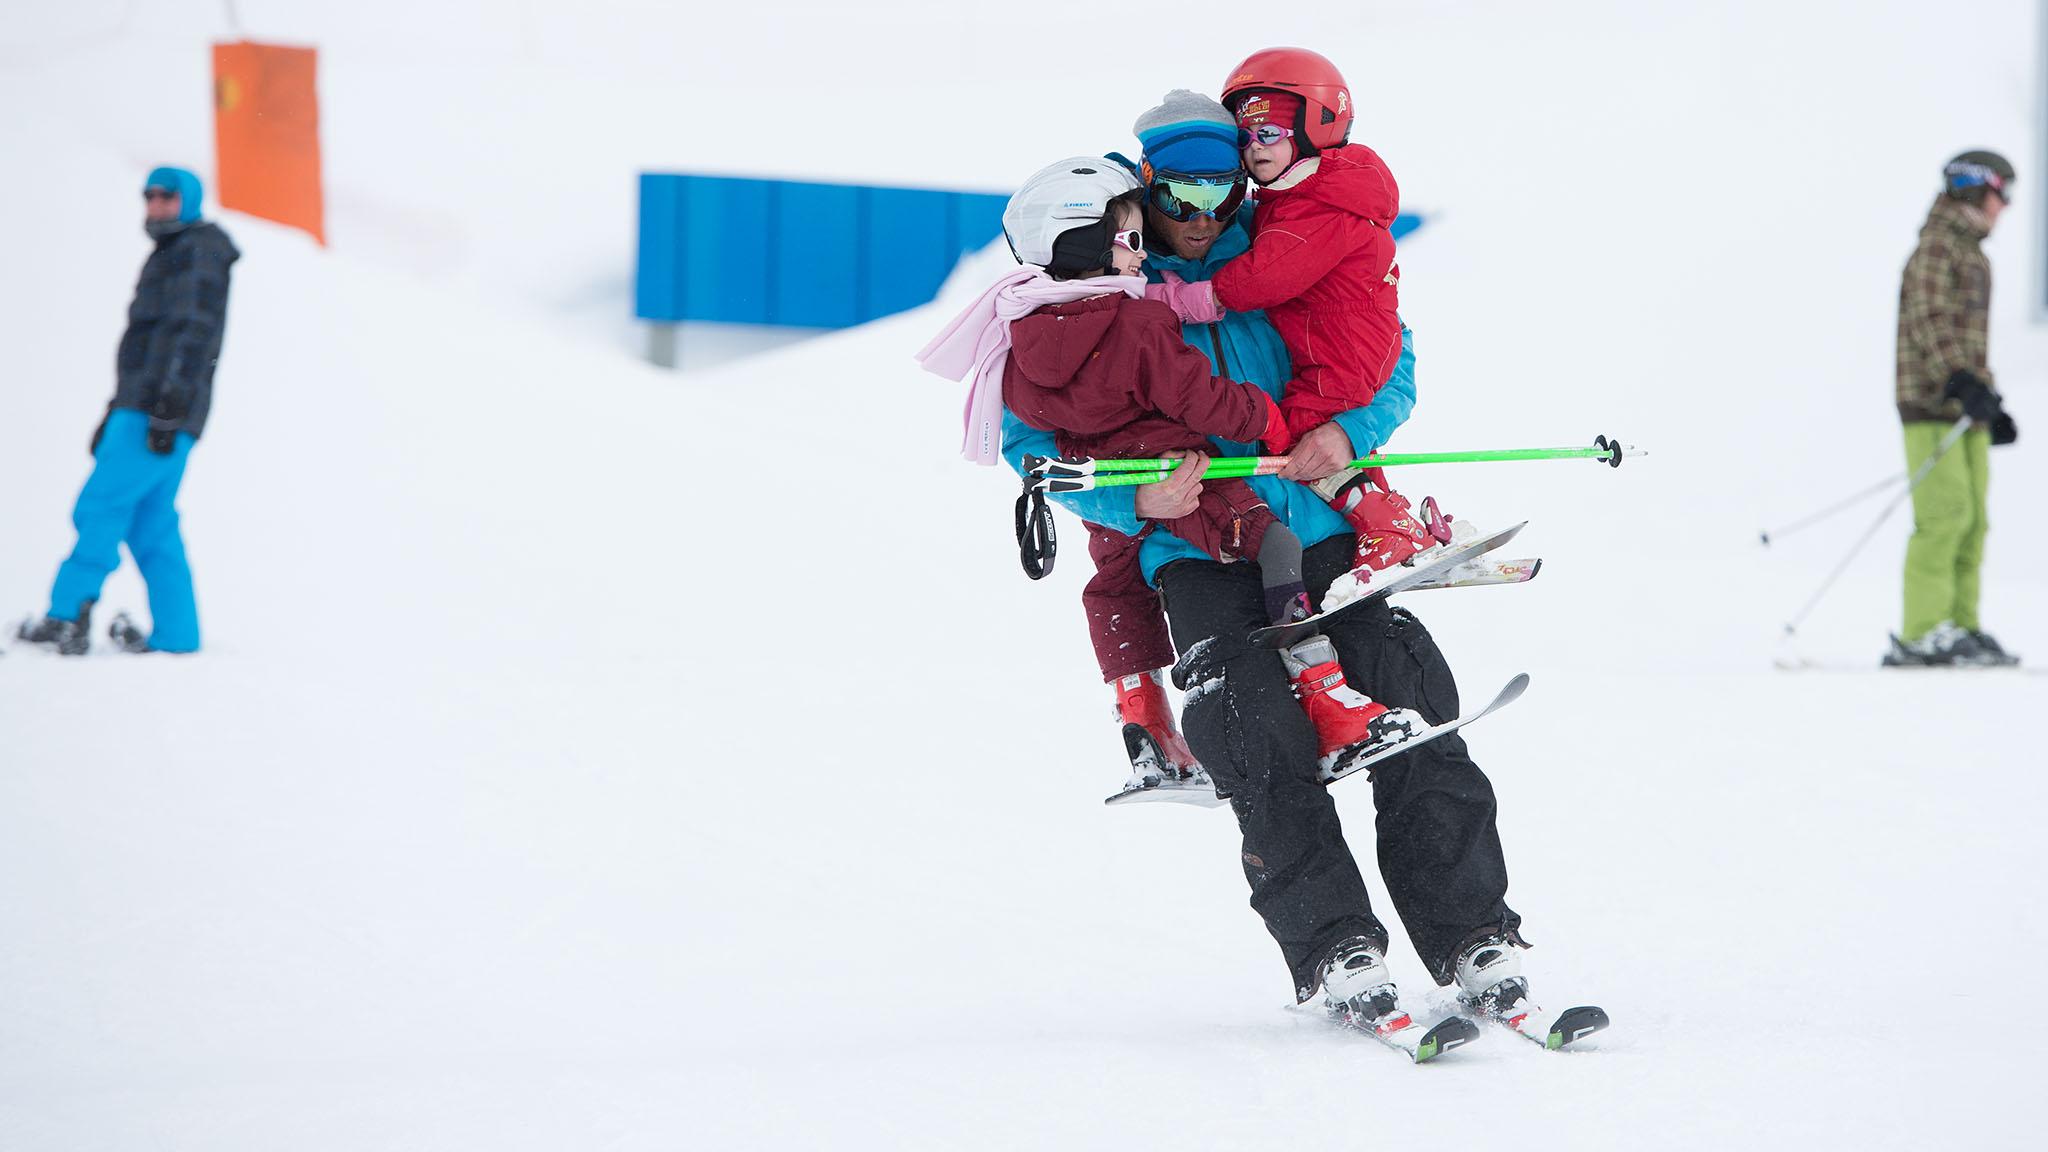 Ski sherpa